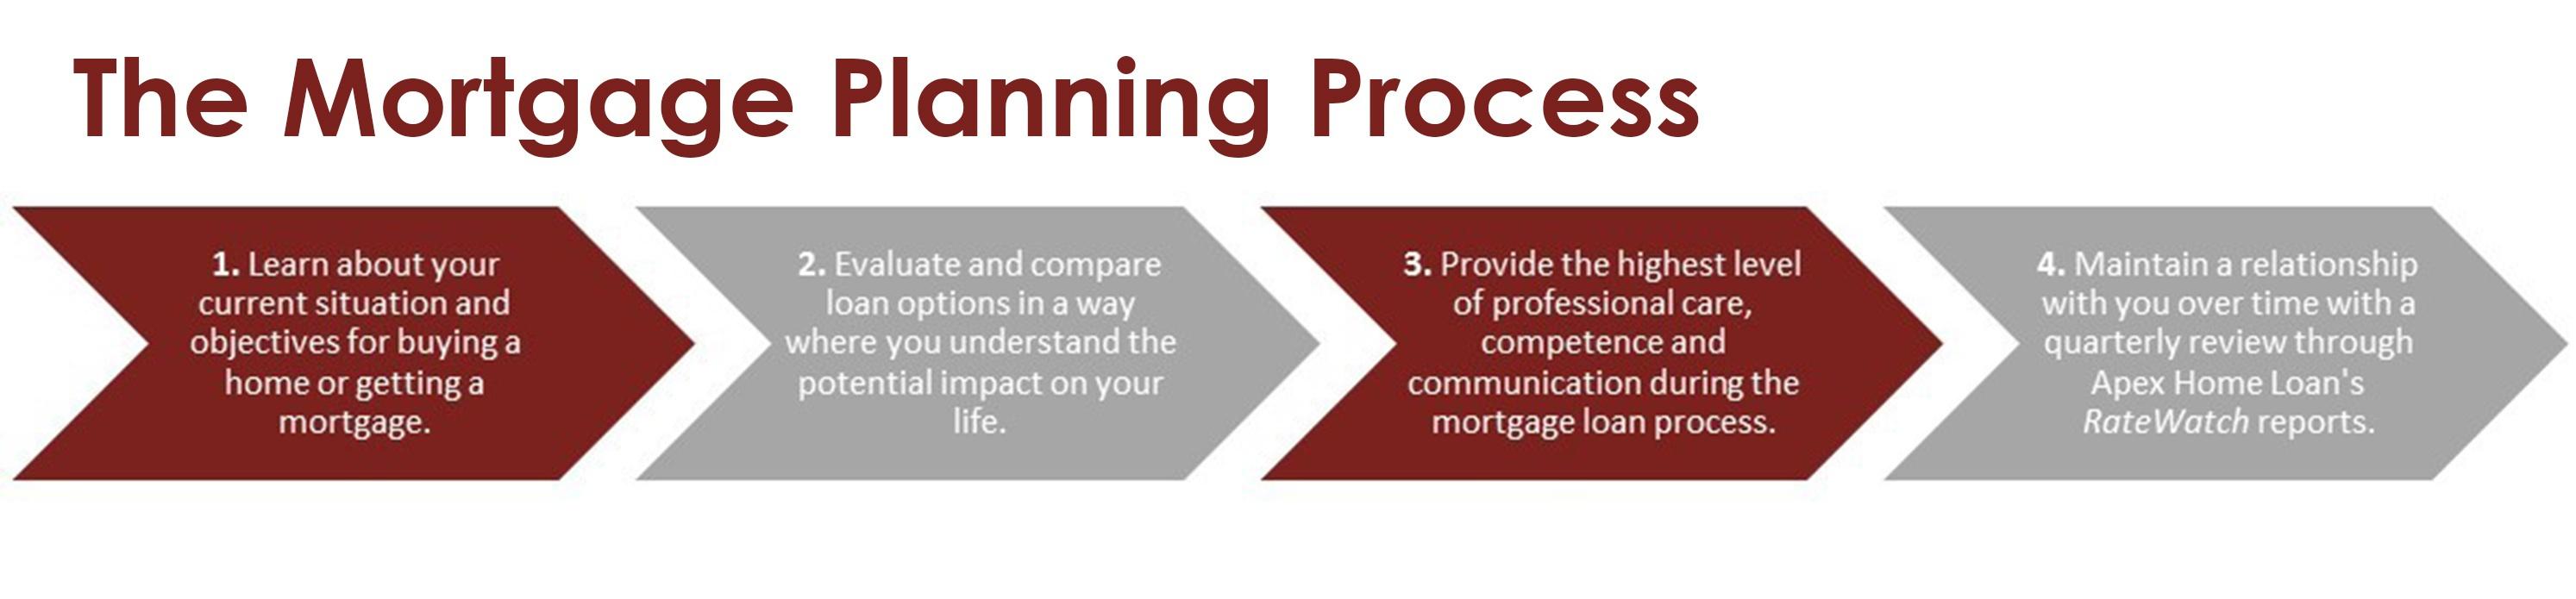 Mortgage_Planning_Chevron-1.jpg